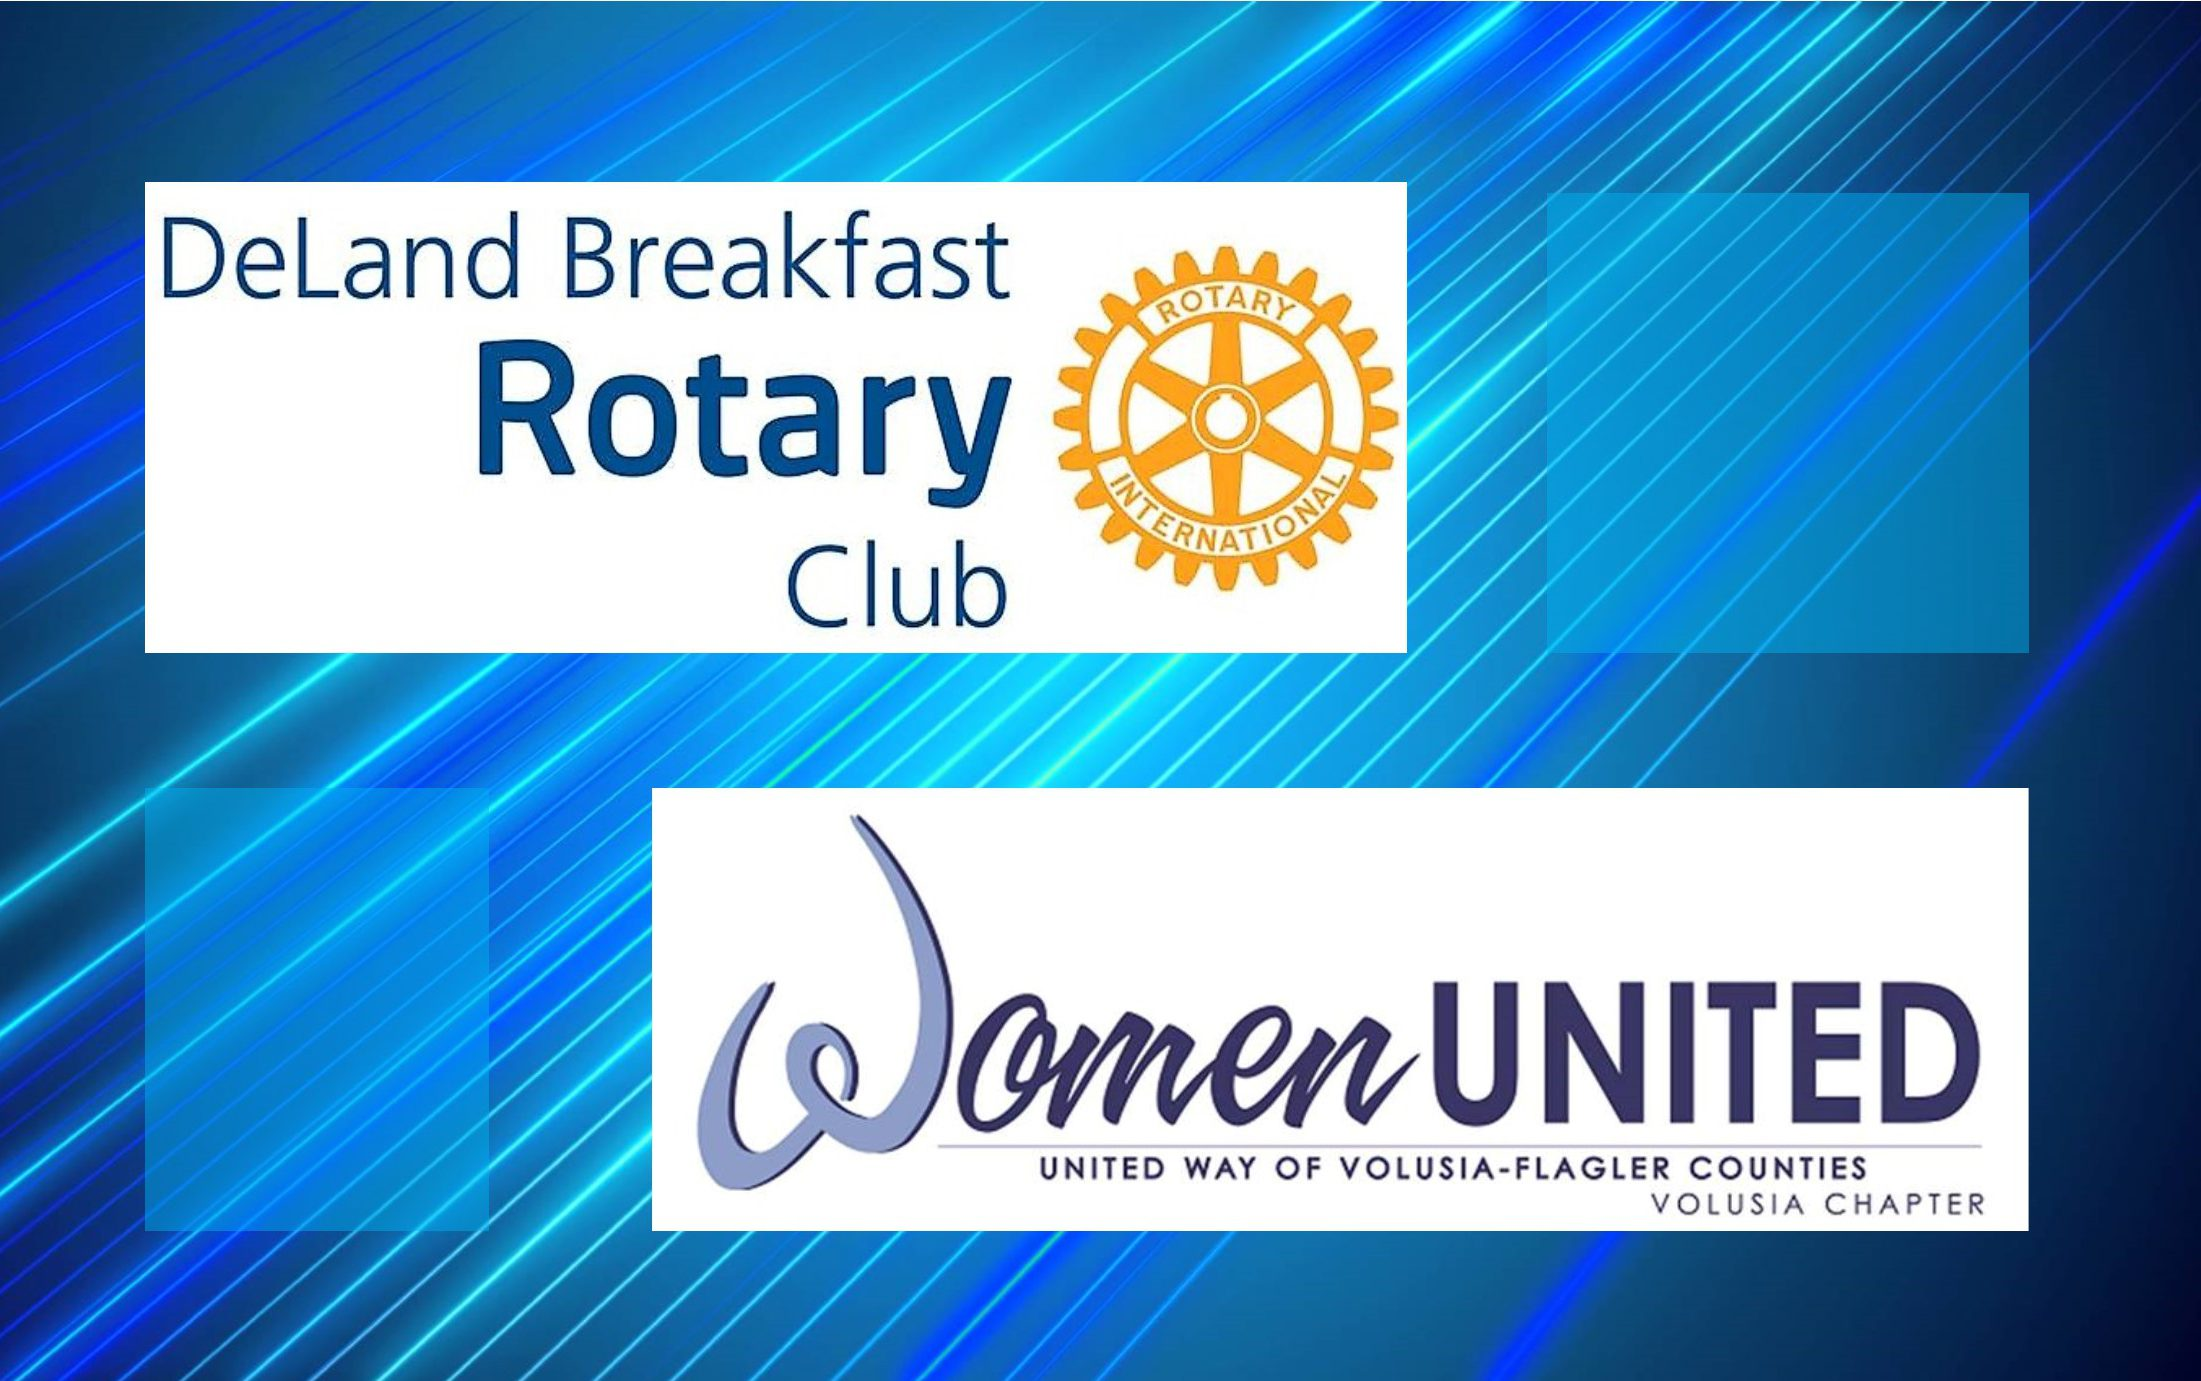 DeLand Breakfast Rotary & Women United